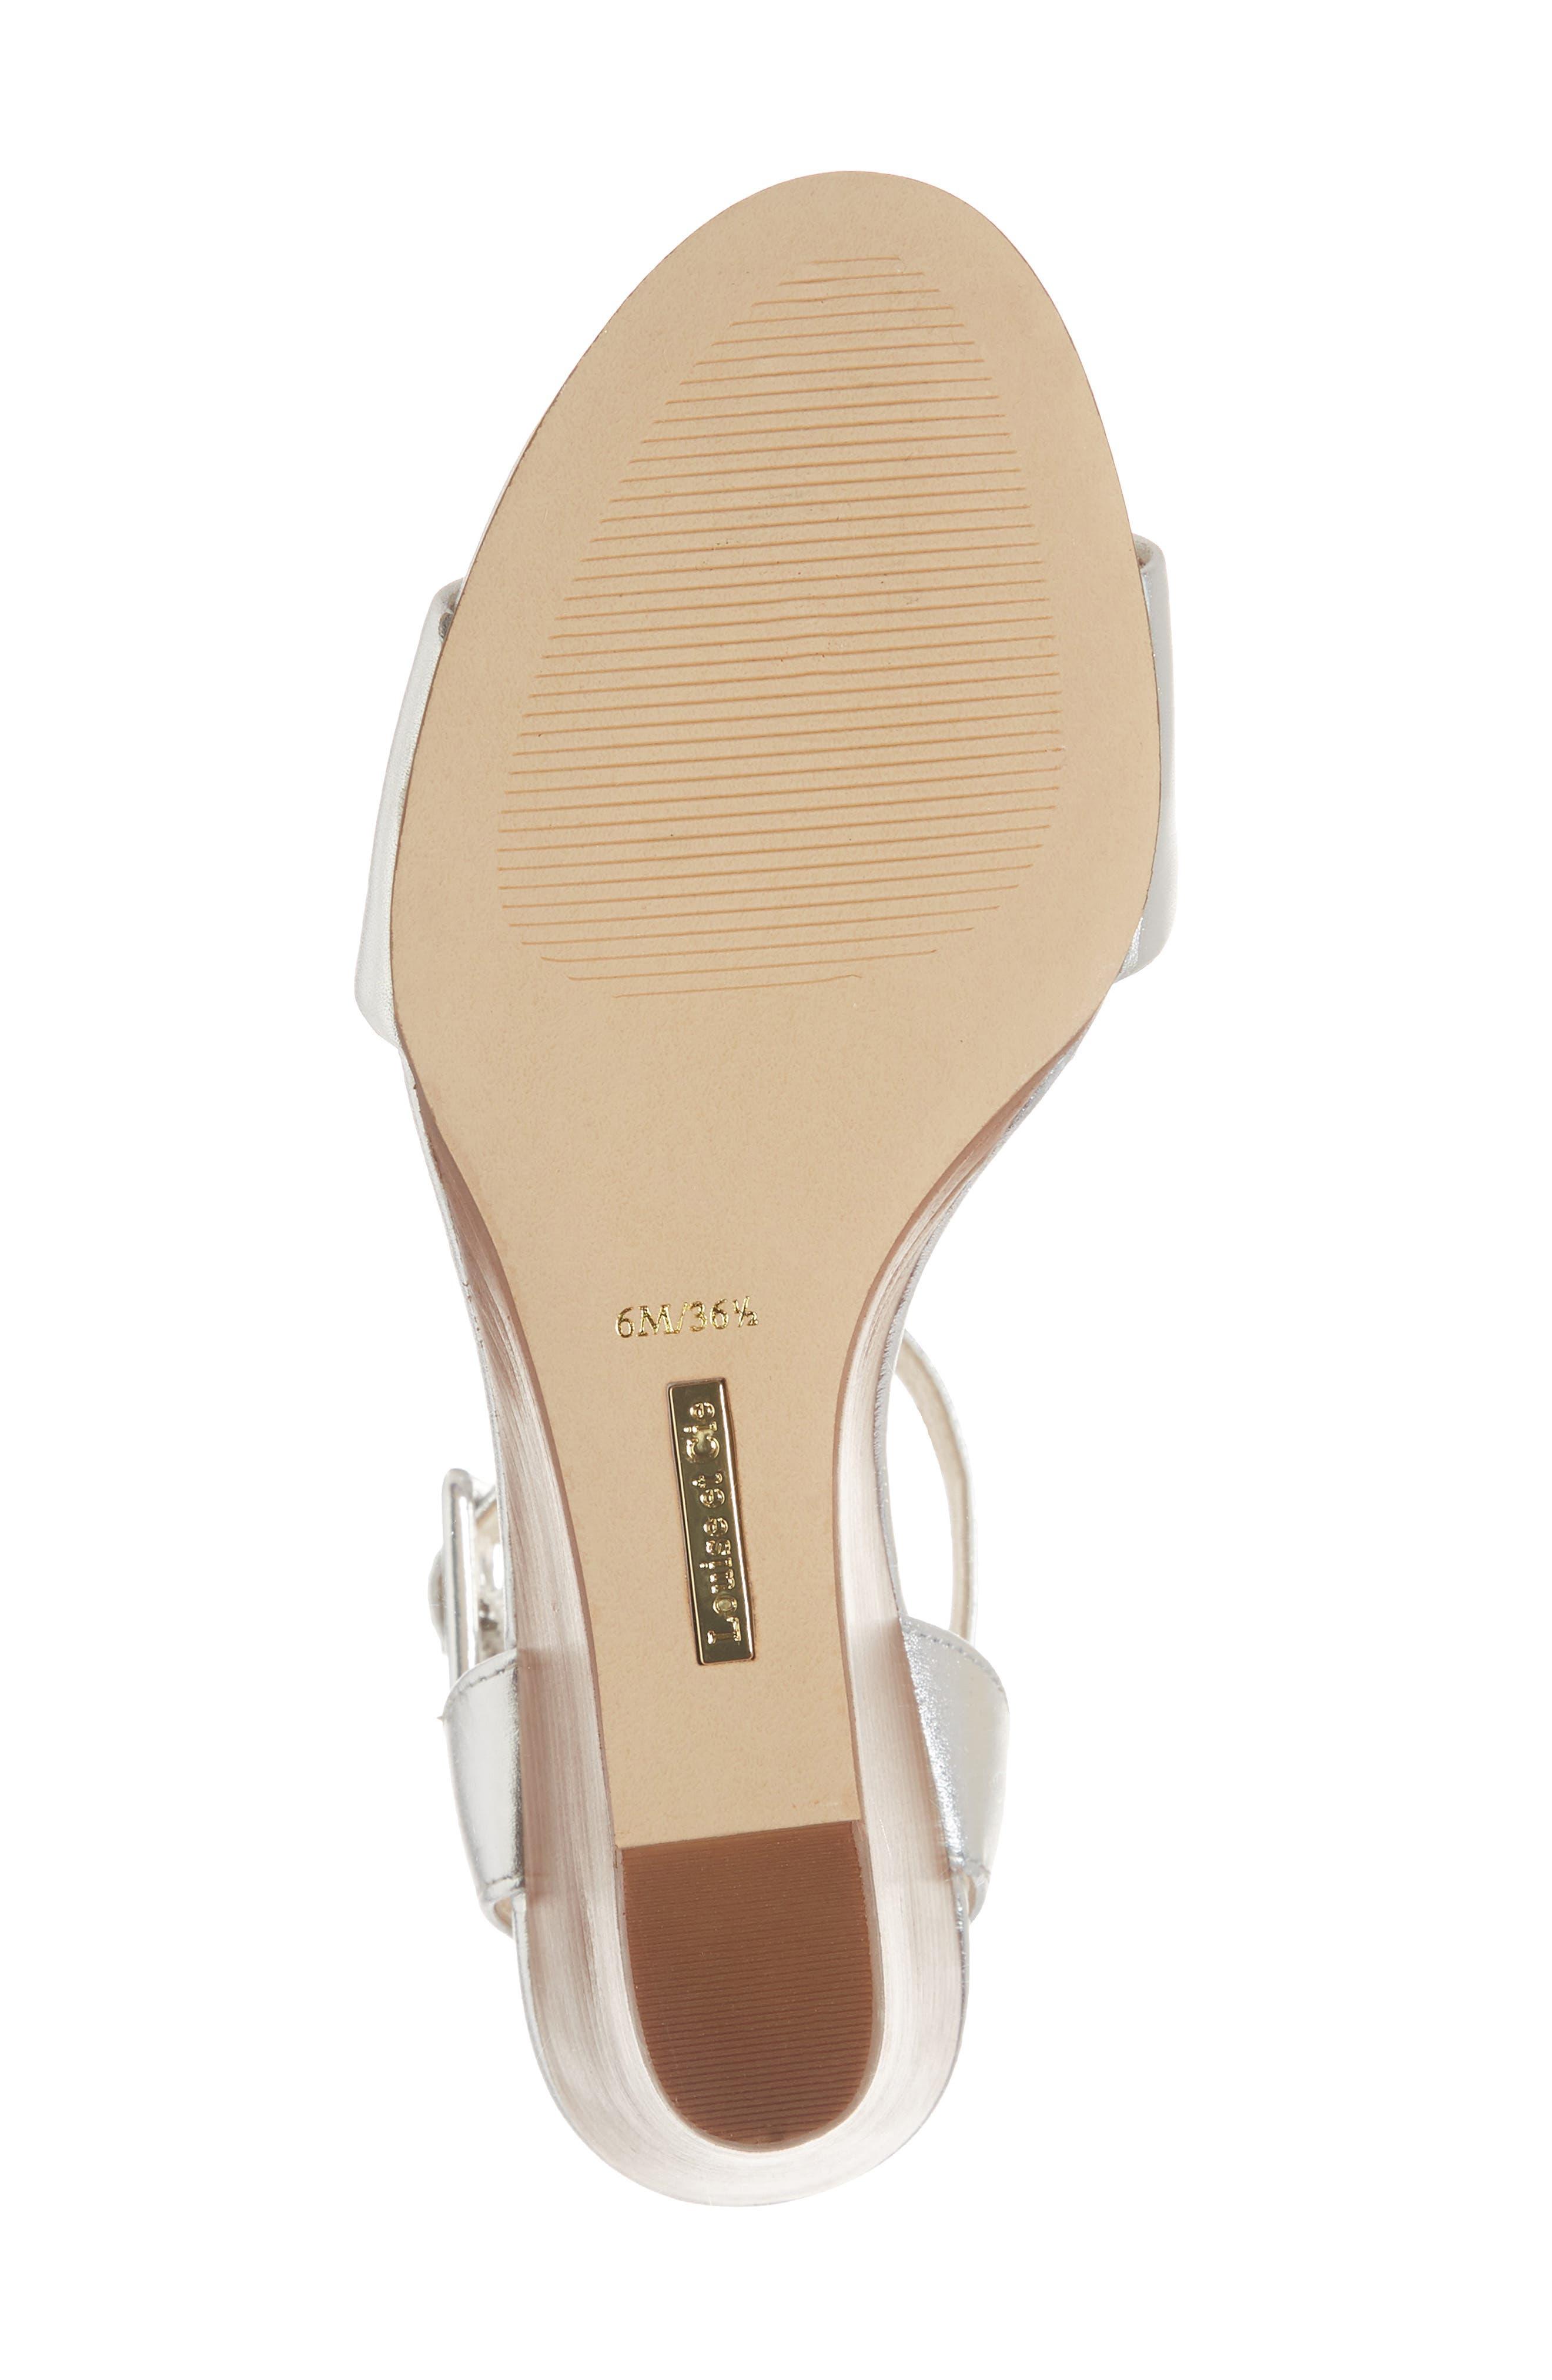 Punya Wedge Sandal,                             Alternate thumbnail 6, color,                             Metallic Silver Leather